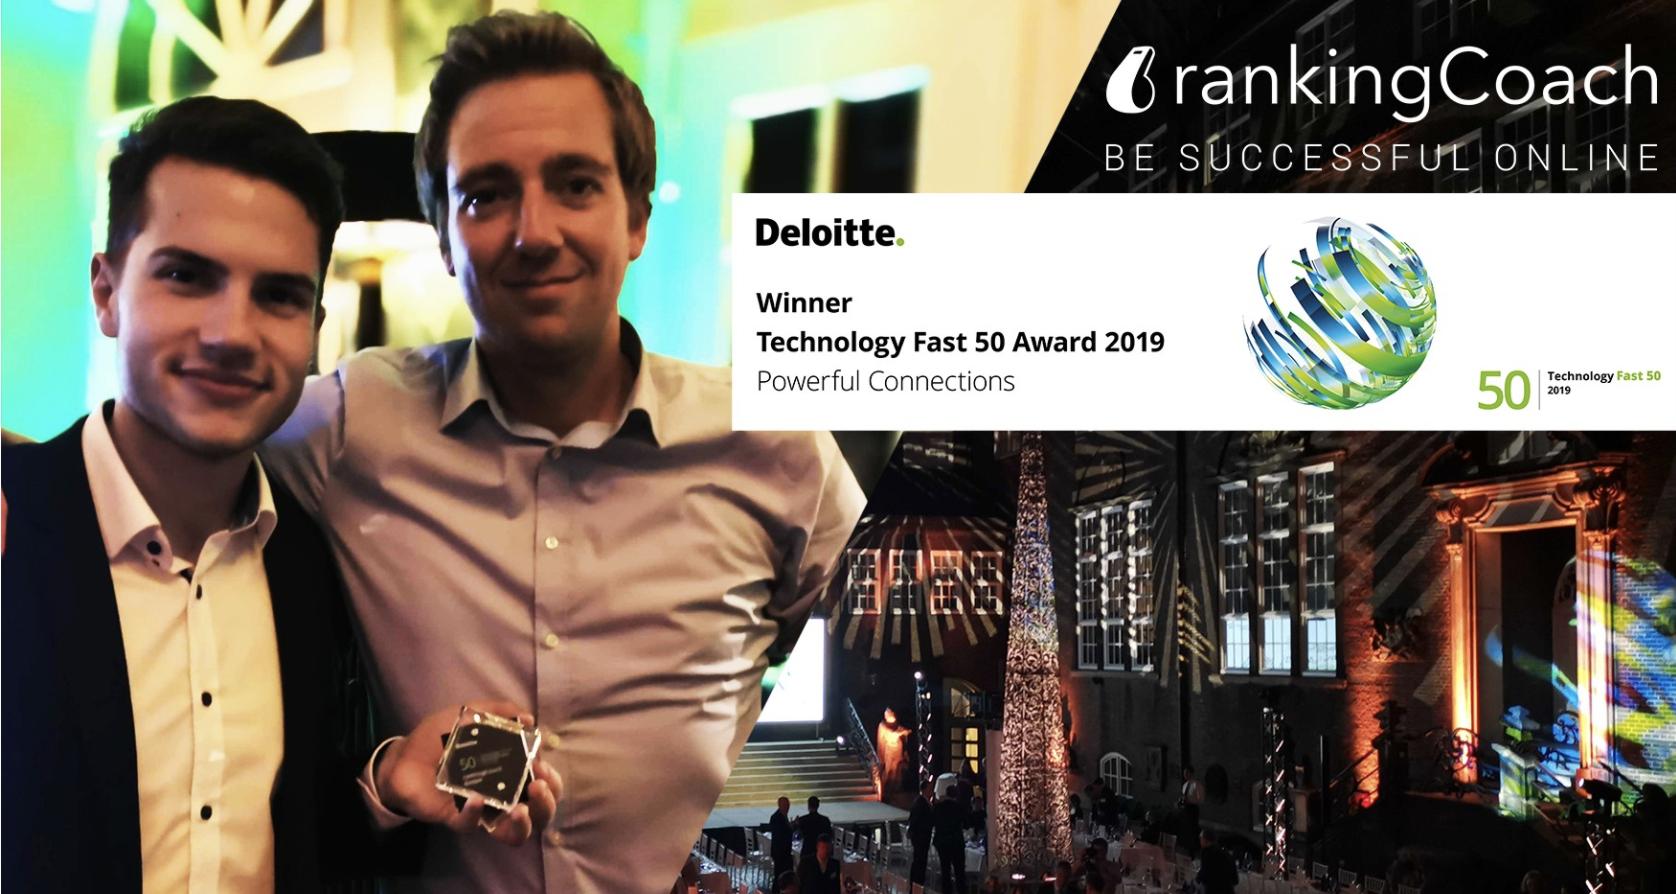 Deloitte Selects rankingCoach Again as Technology Fast 50 Tech Company 2019